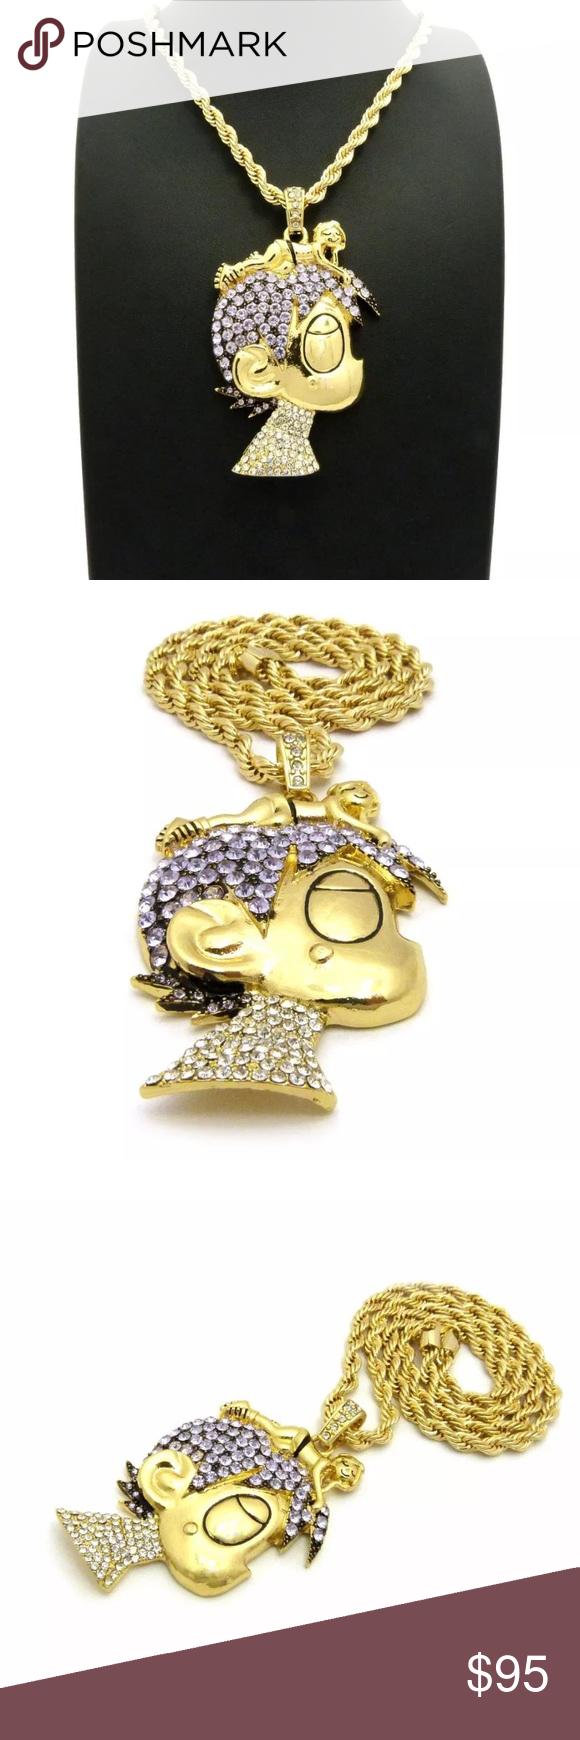 Lil uzi vert cartoon hip hop necklace pendant set nwt pinterest lil uzi vert cartoon hip hop necklace pendant set iced out lil uzi vert cartoon pendant aloadofball Gallery